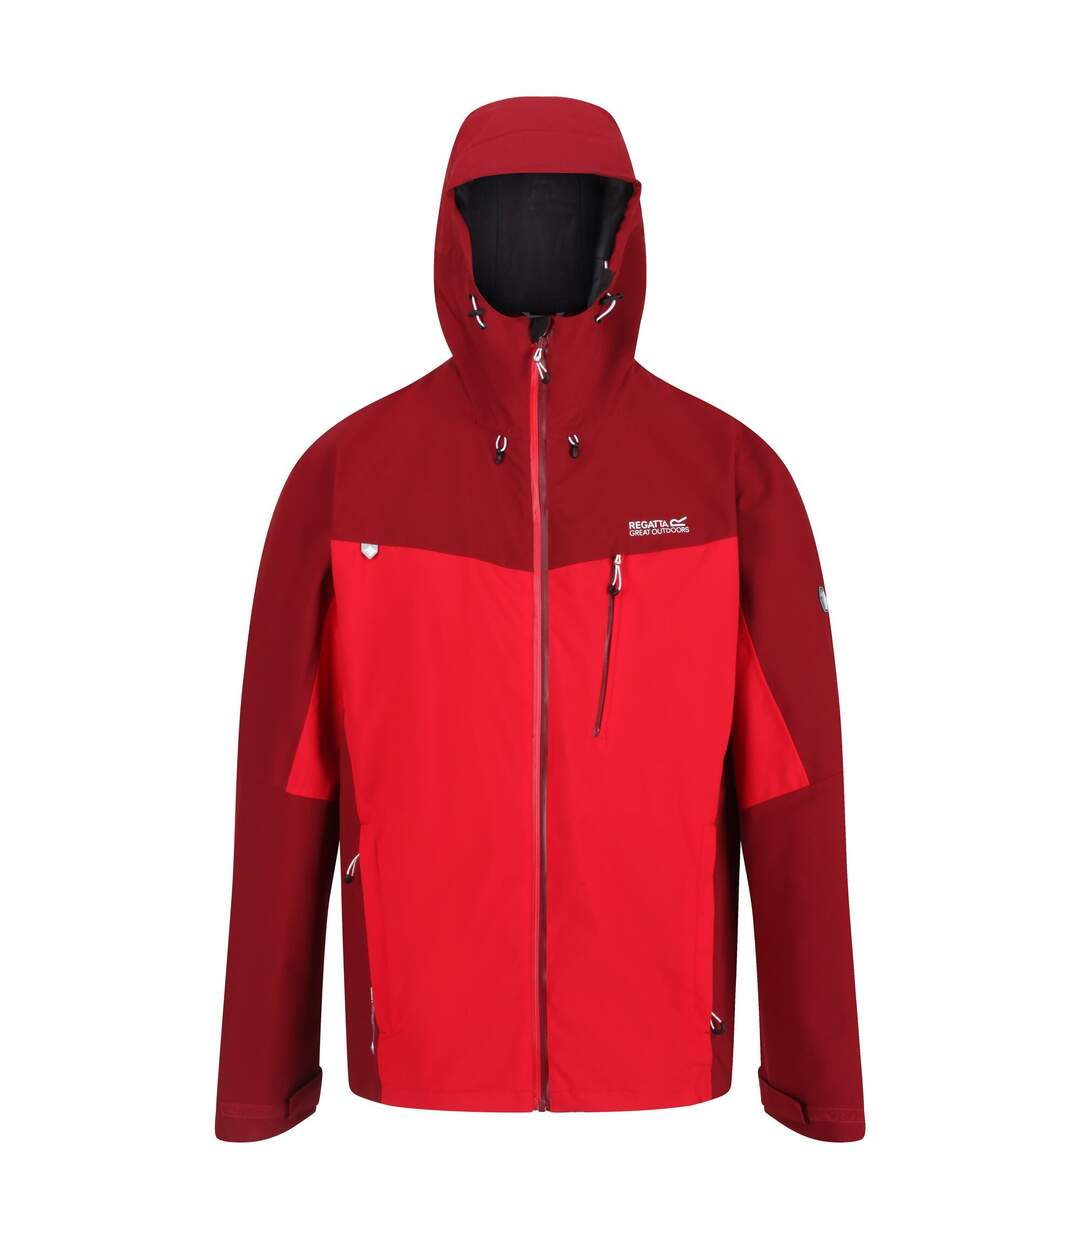 Regatta Mens Birchdale Waterproof Hooded Jacket (True Red/Delhi Red) - UTRG3474